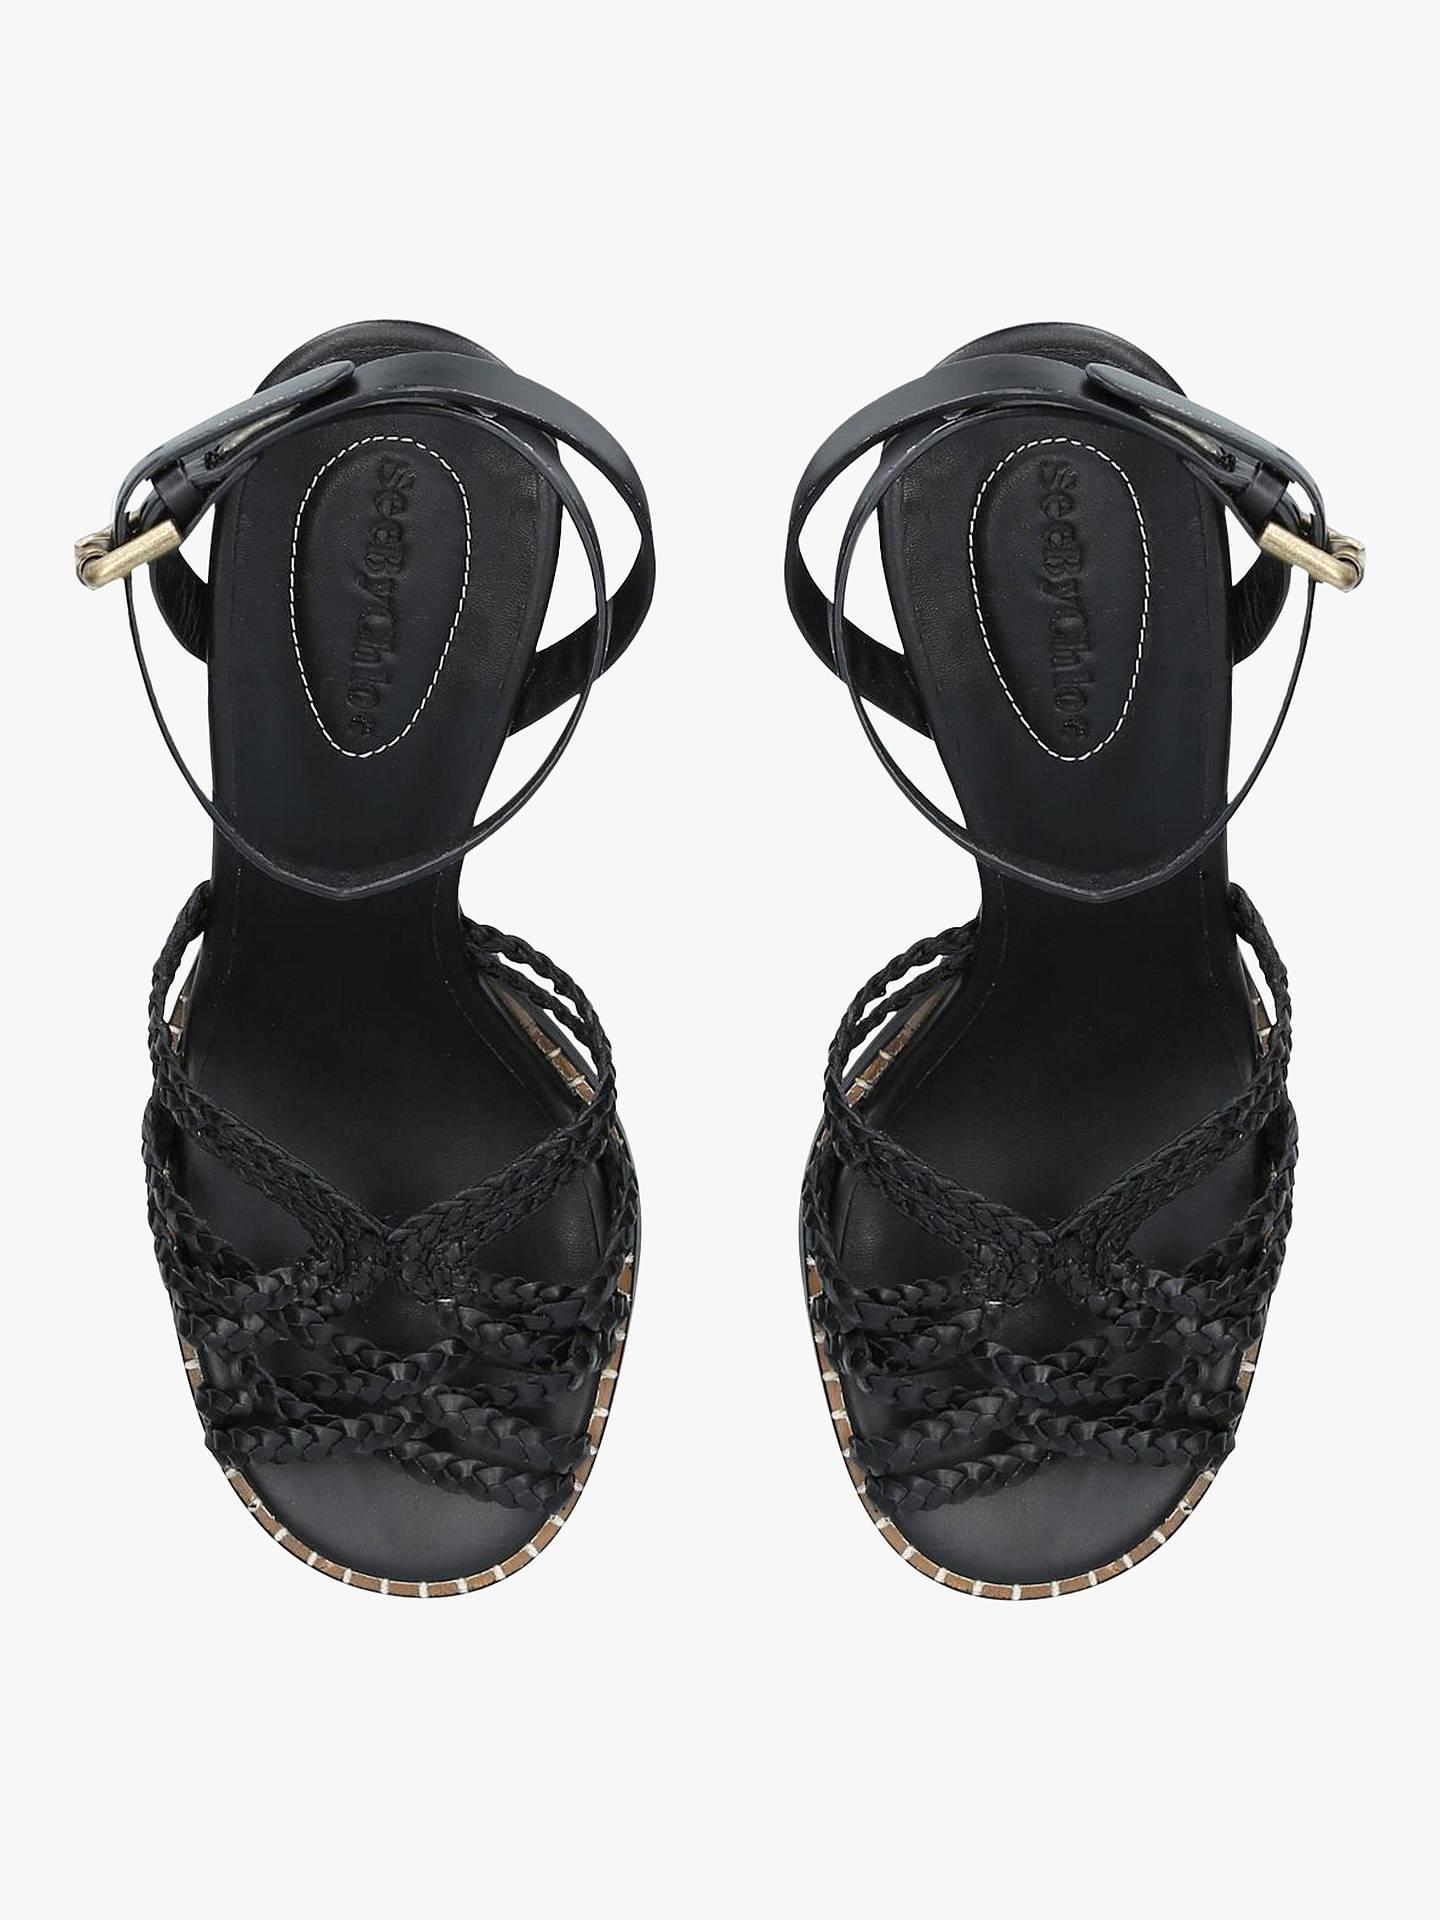 cc561b403b8 ... Buy See By Chloé Gladiator Braid Block Heel Sandals